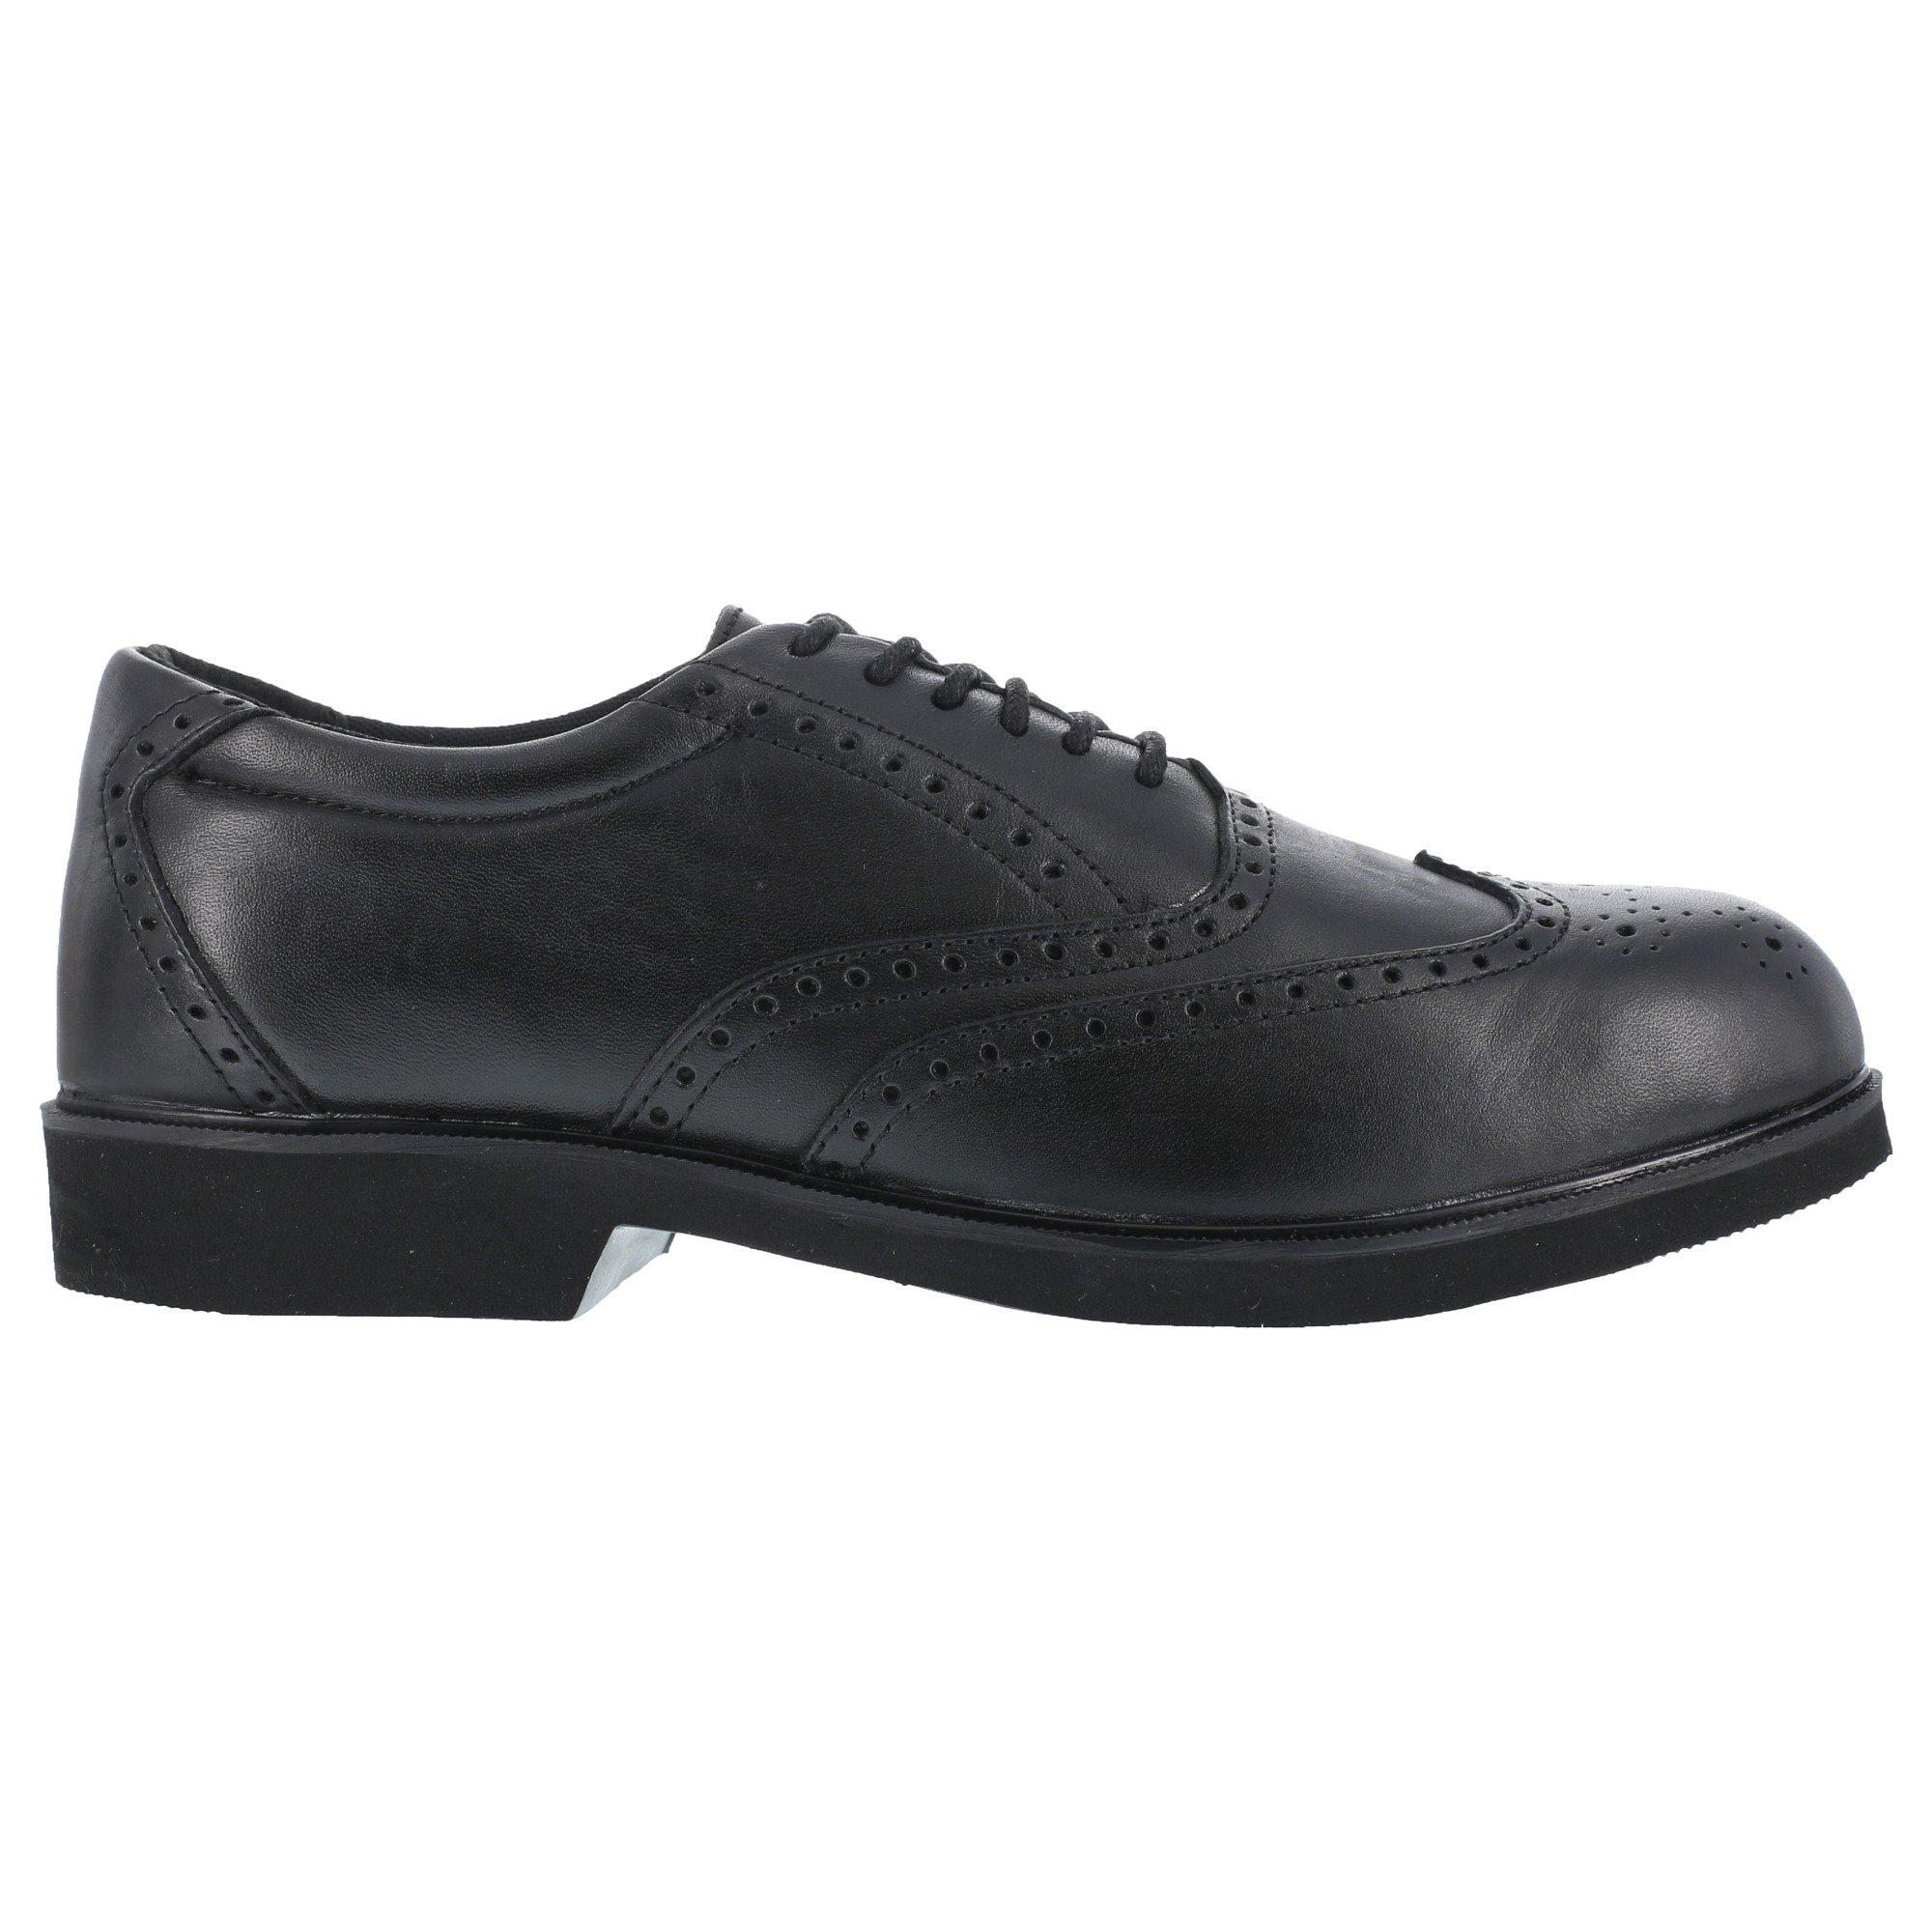 Rockport Work Men's RK6741 Work Shoe,Black,13 W US